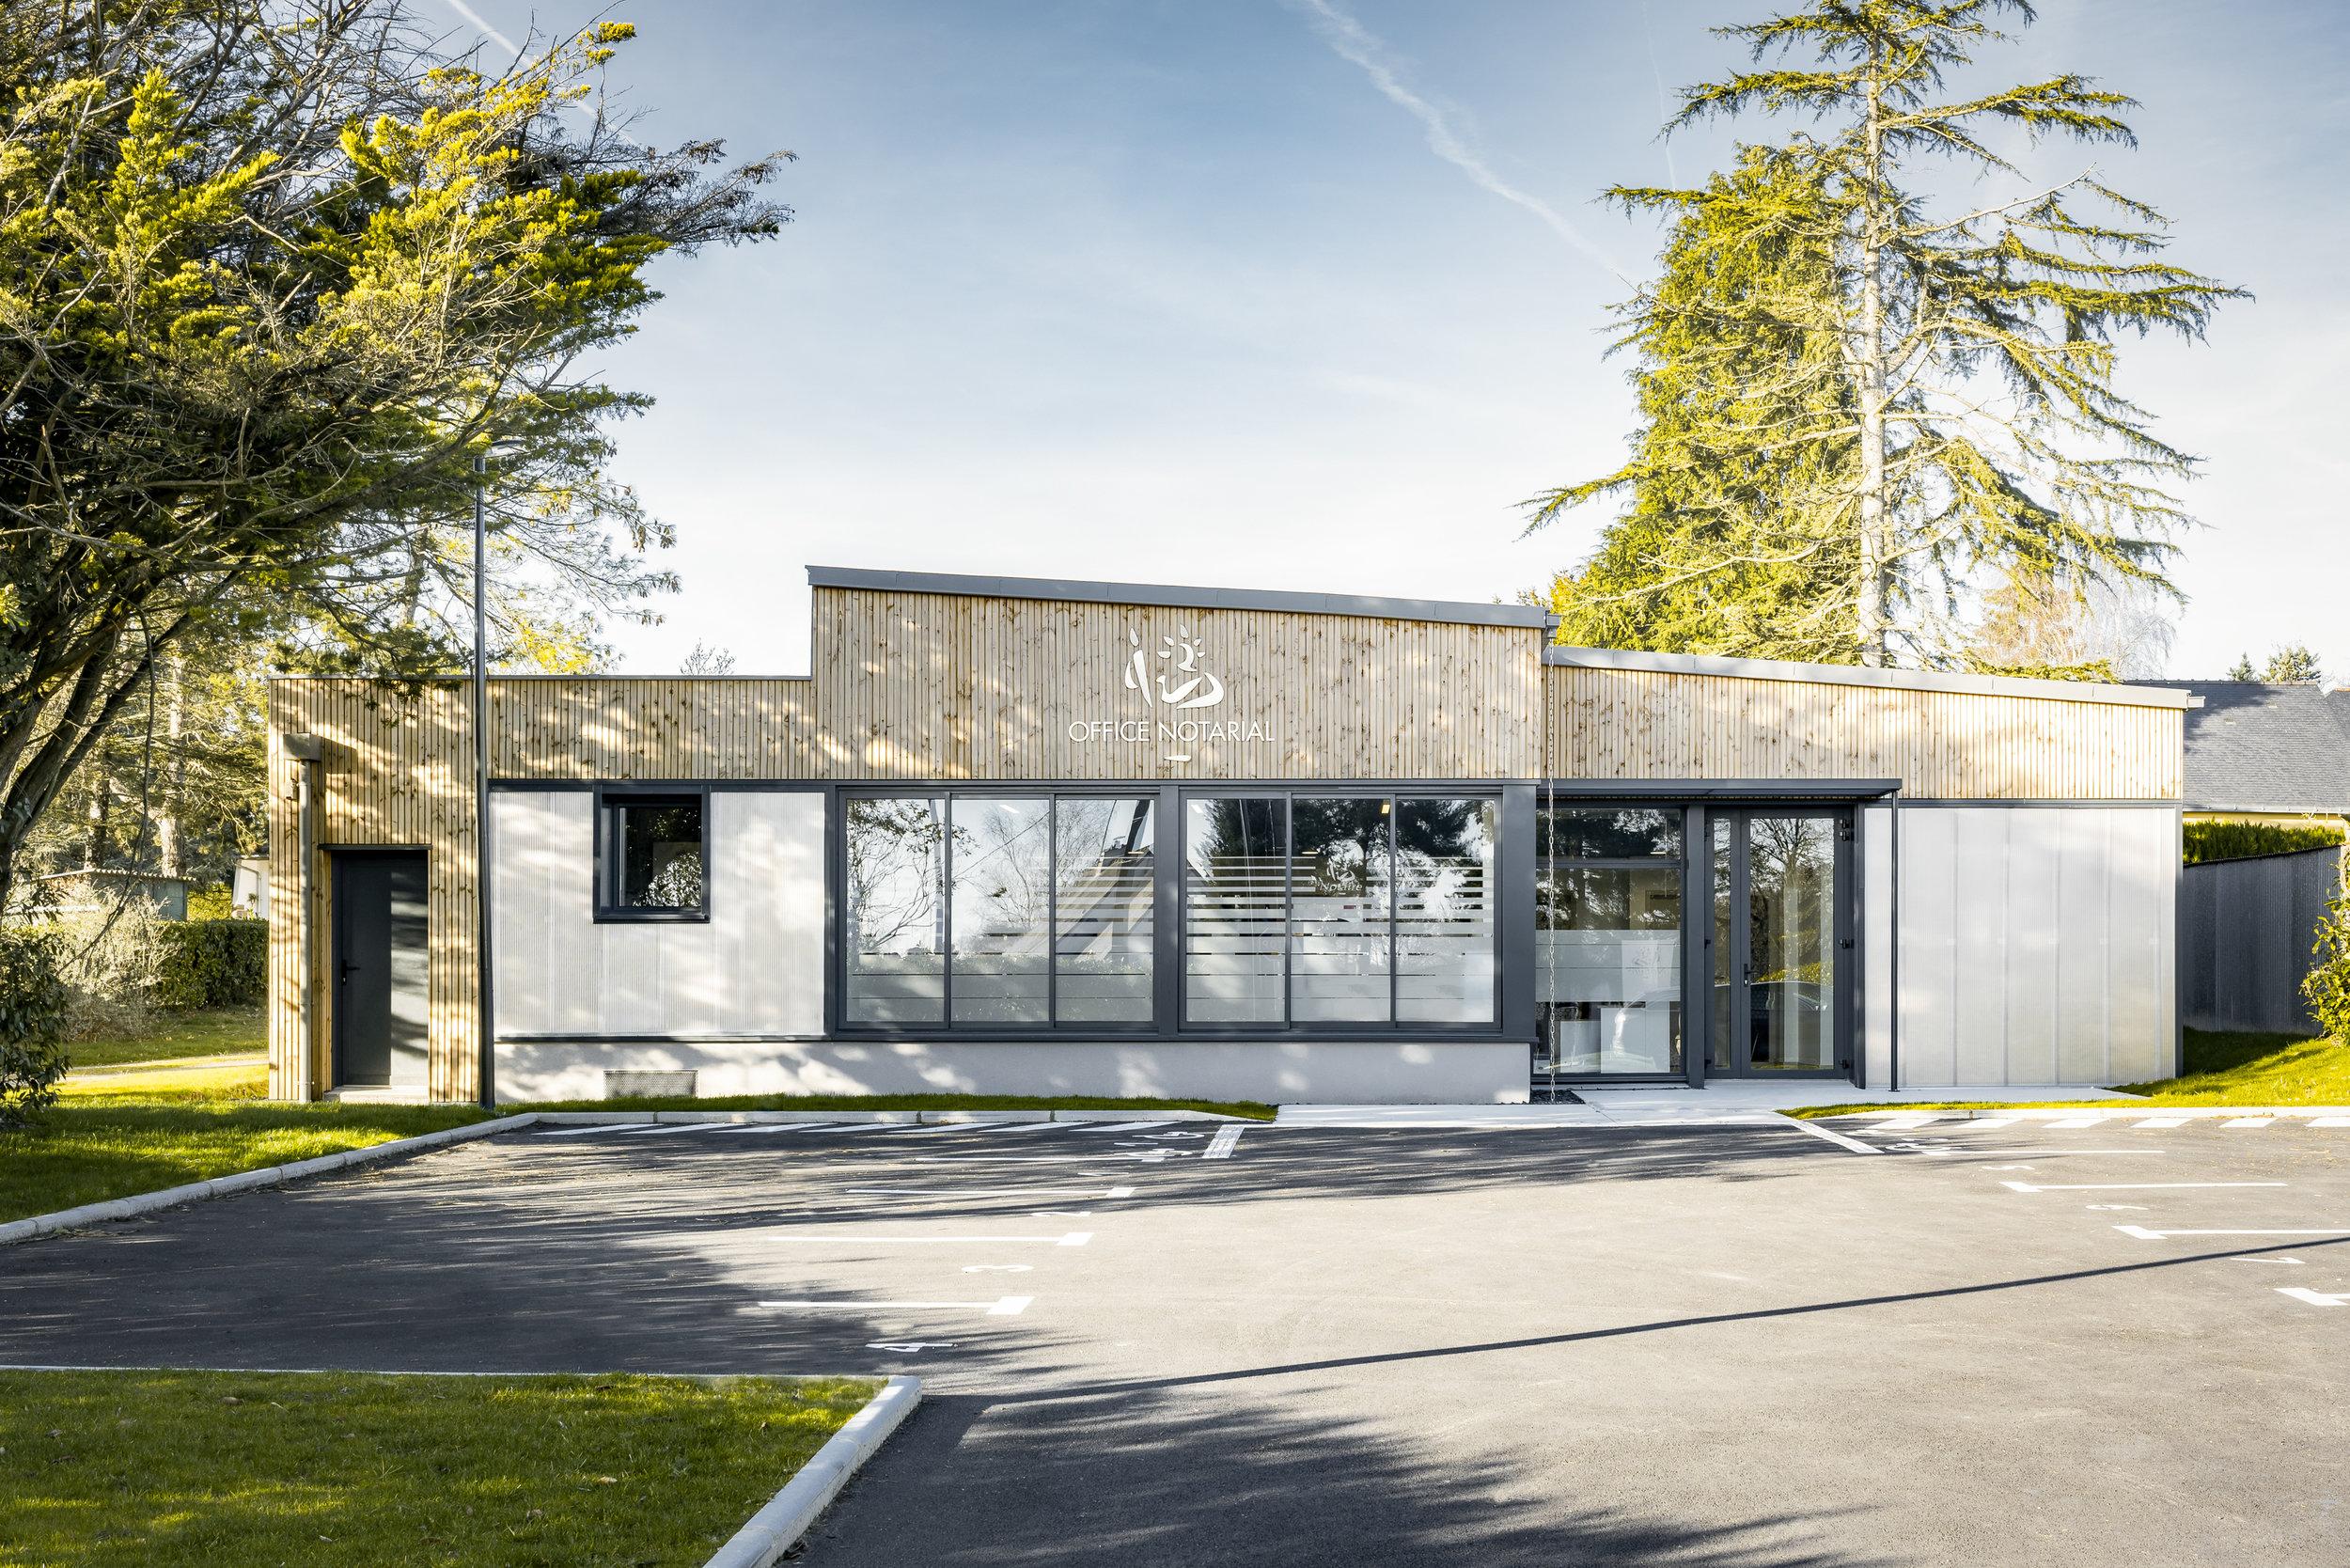 Office Notarial Guémené-Penfao Rennes (35) Maro Architectes construction 1.jpg